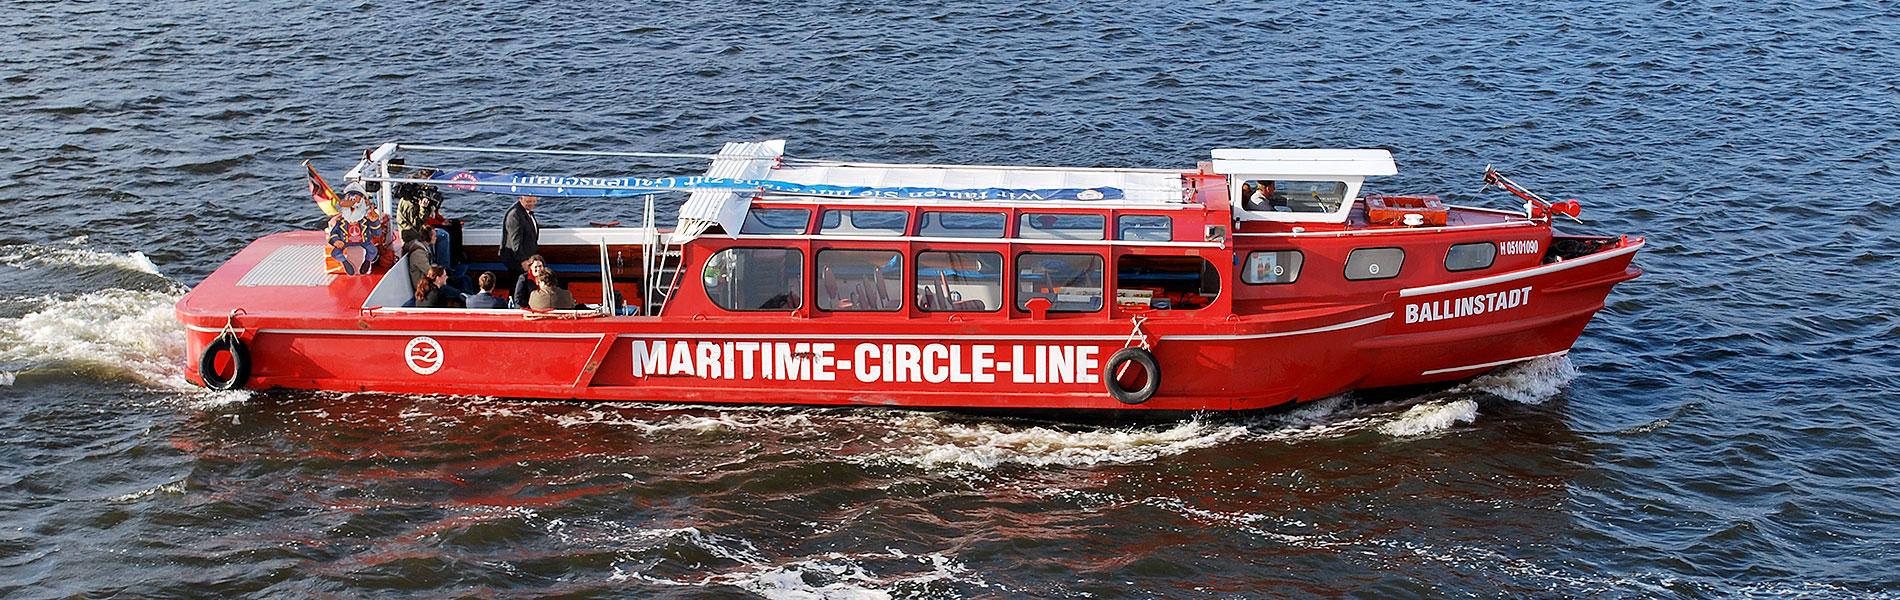 barkasse maritim-circle-line